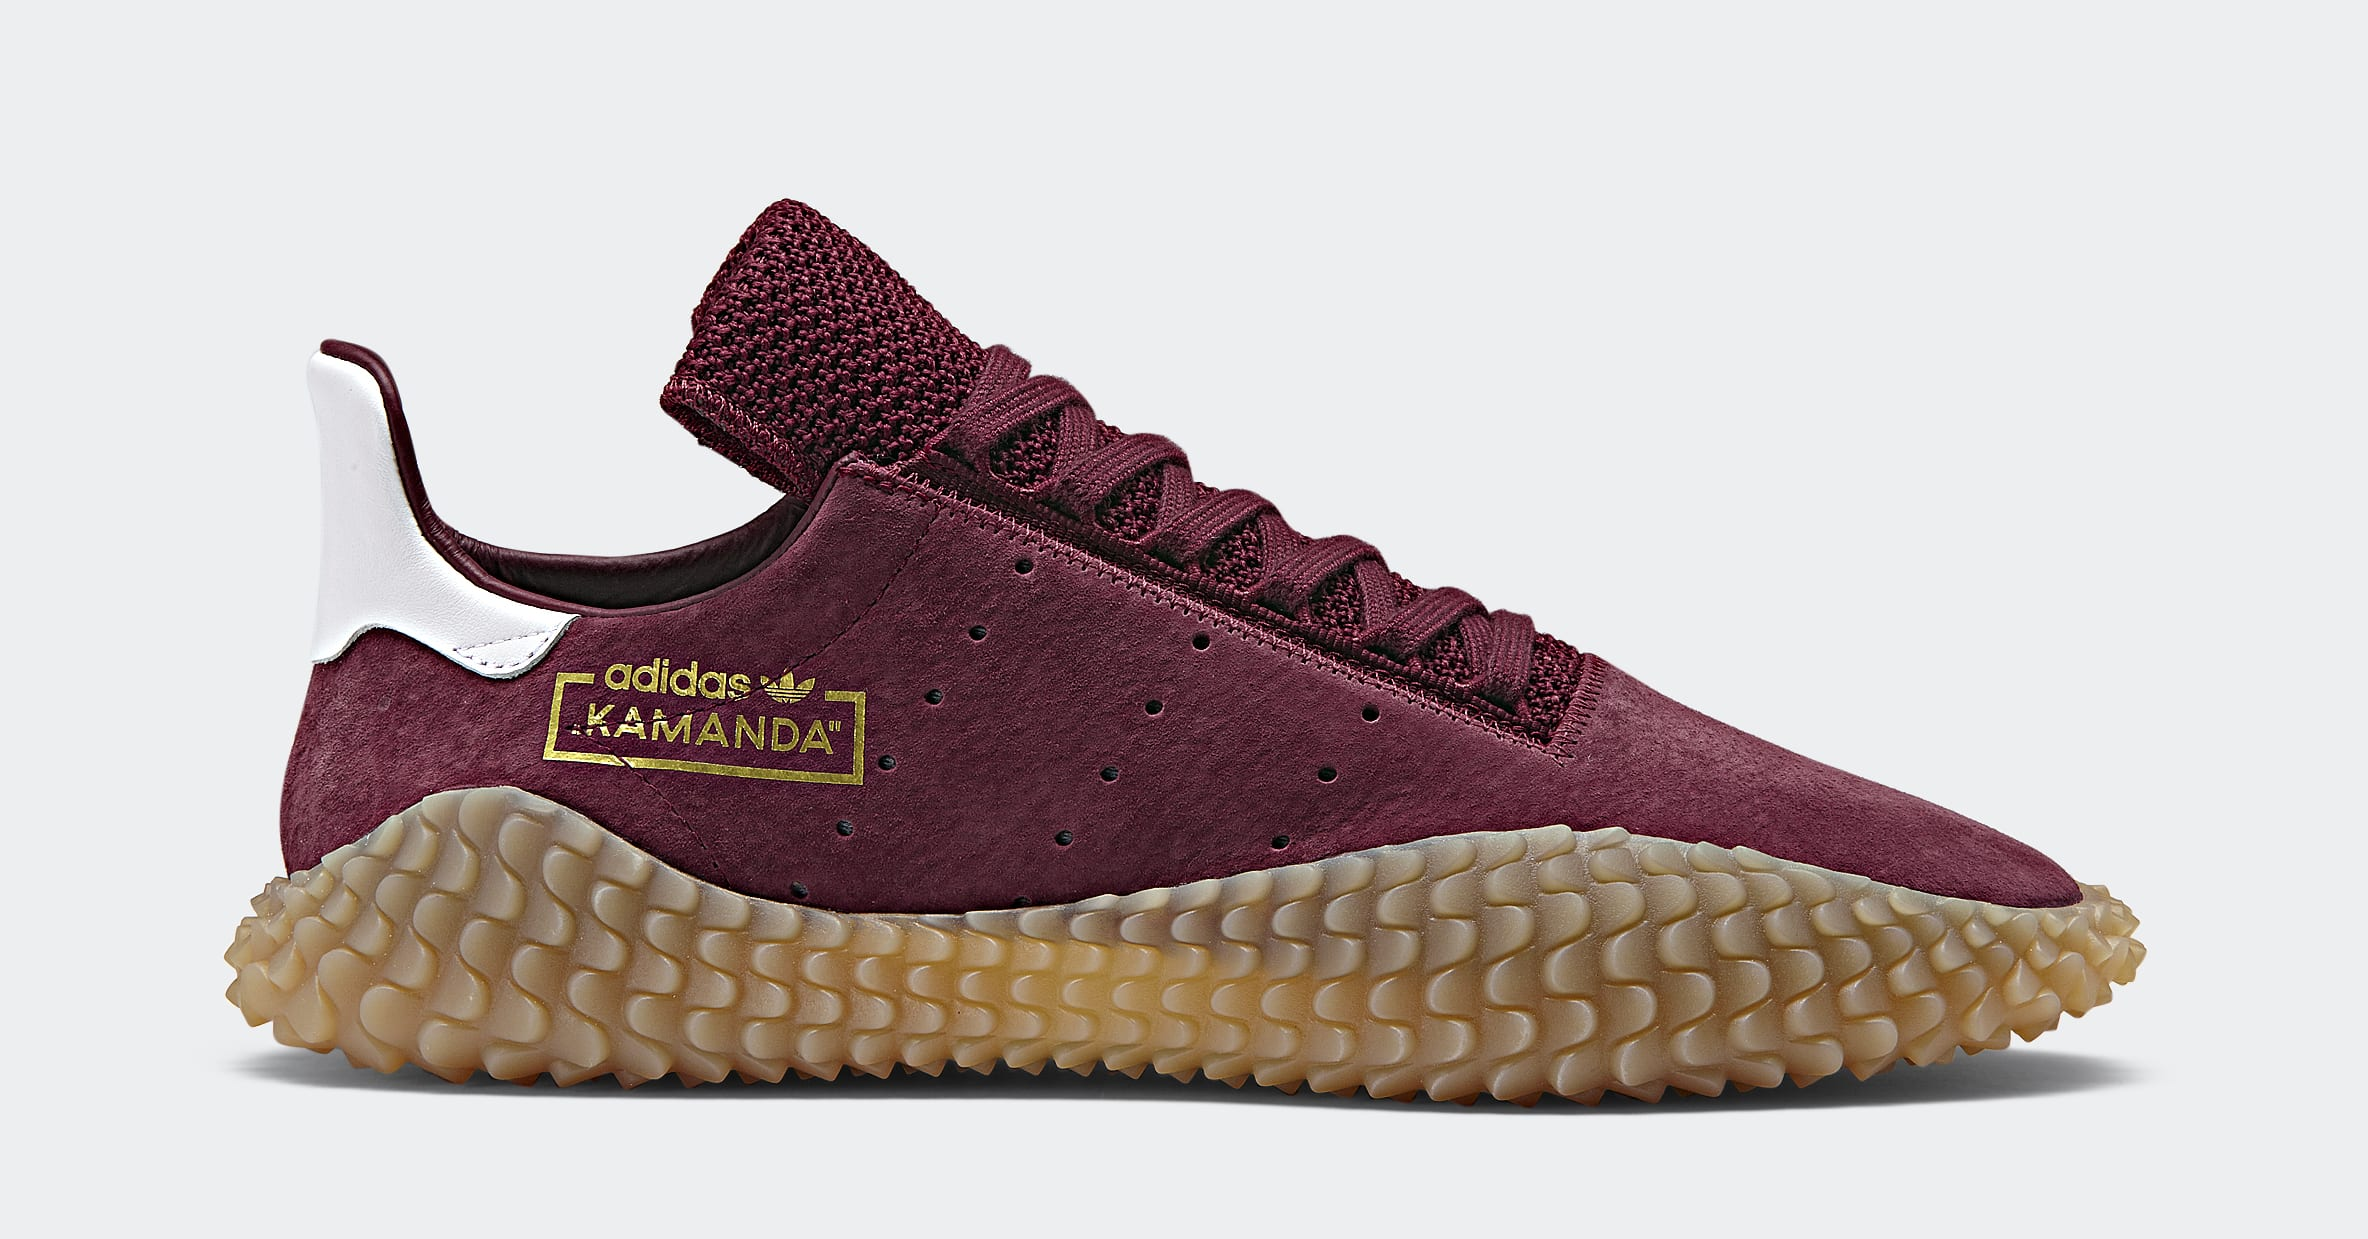 Adidas Kamanda 'Collegiate Burgundy/Gum' CQ2219 (Lateral)